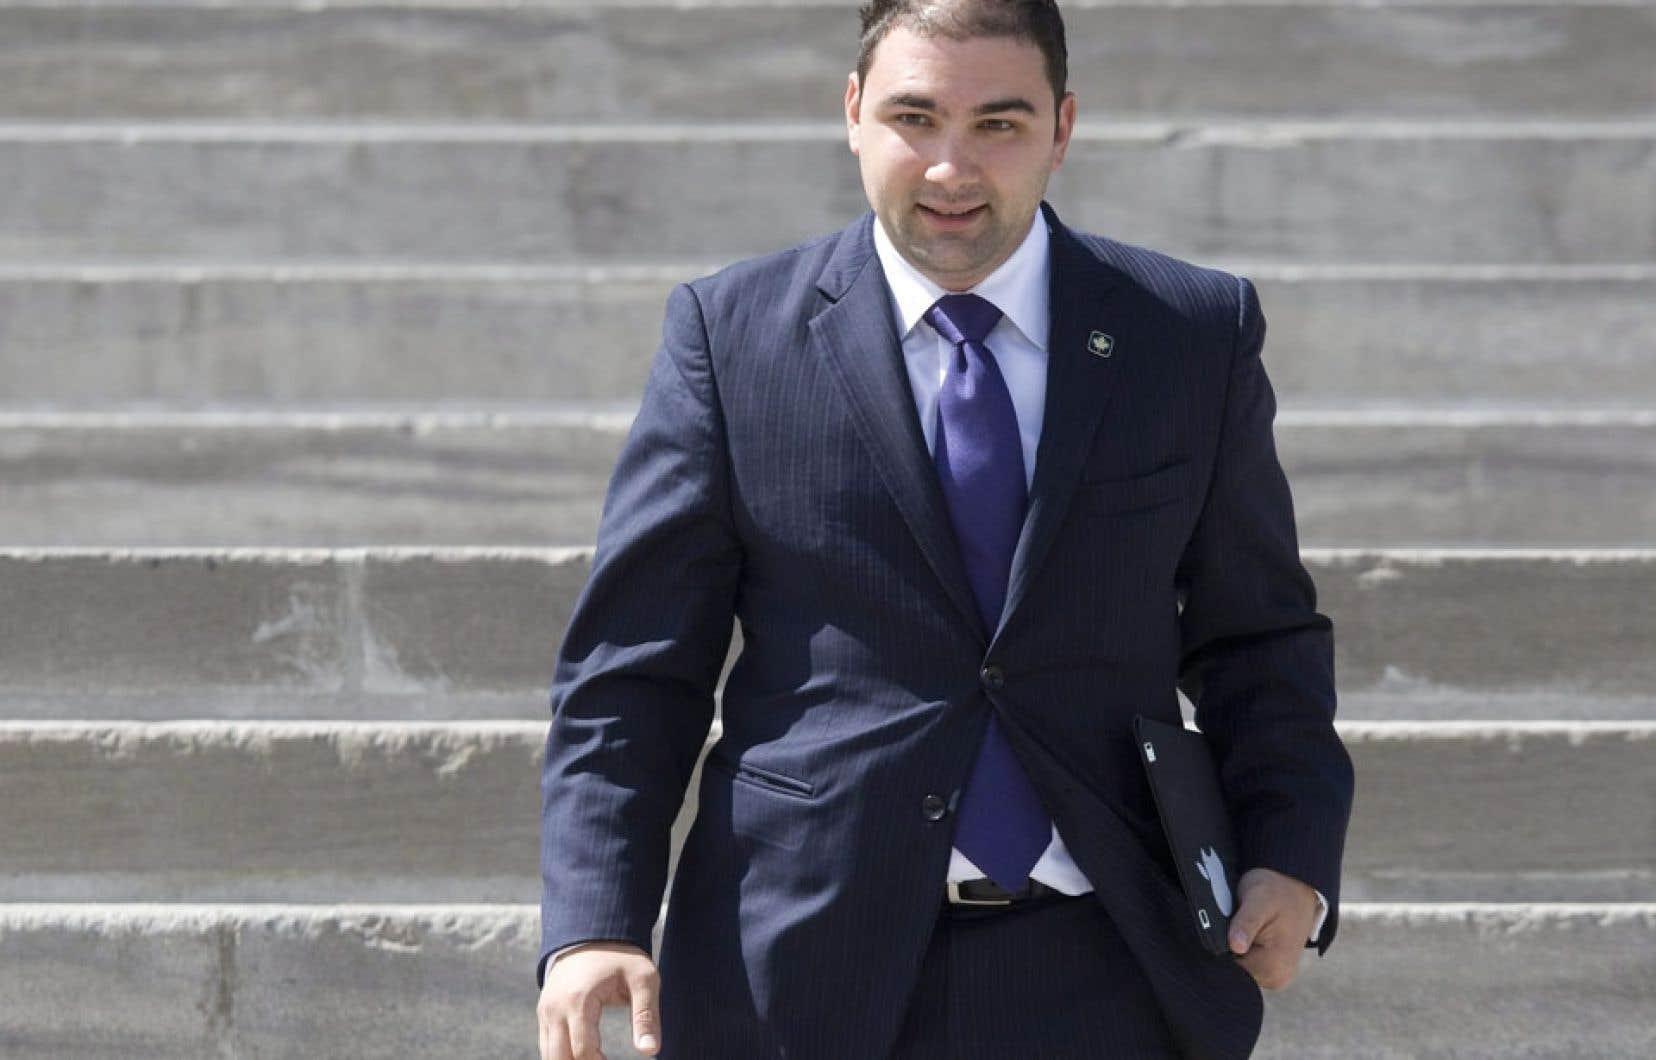 Dimitri Soudas